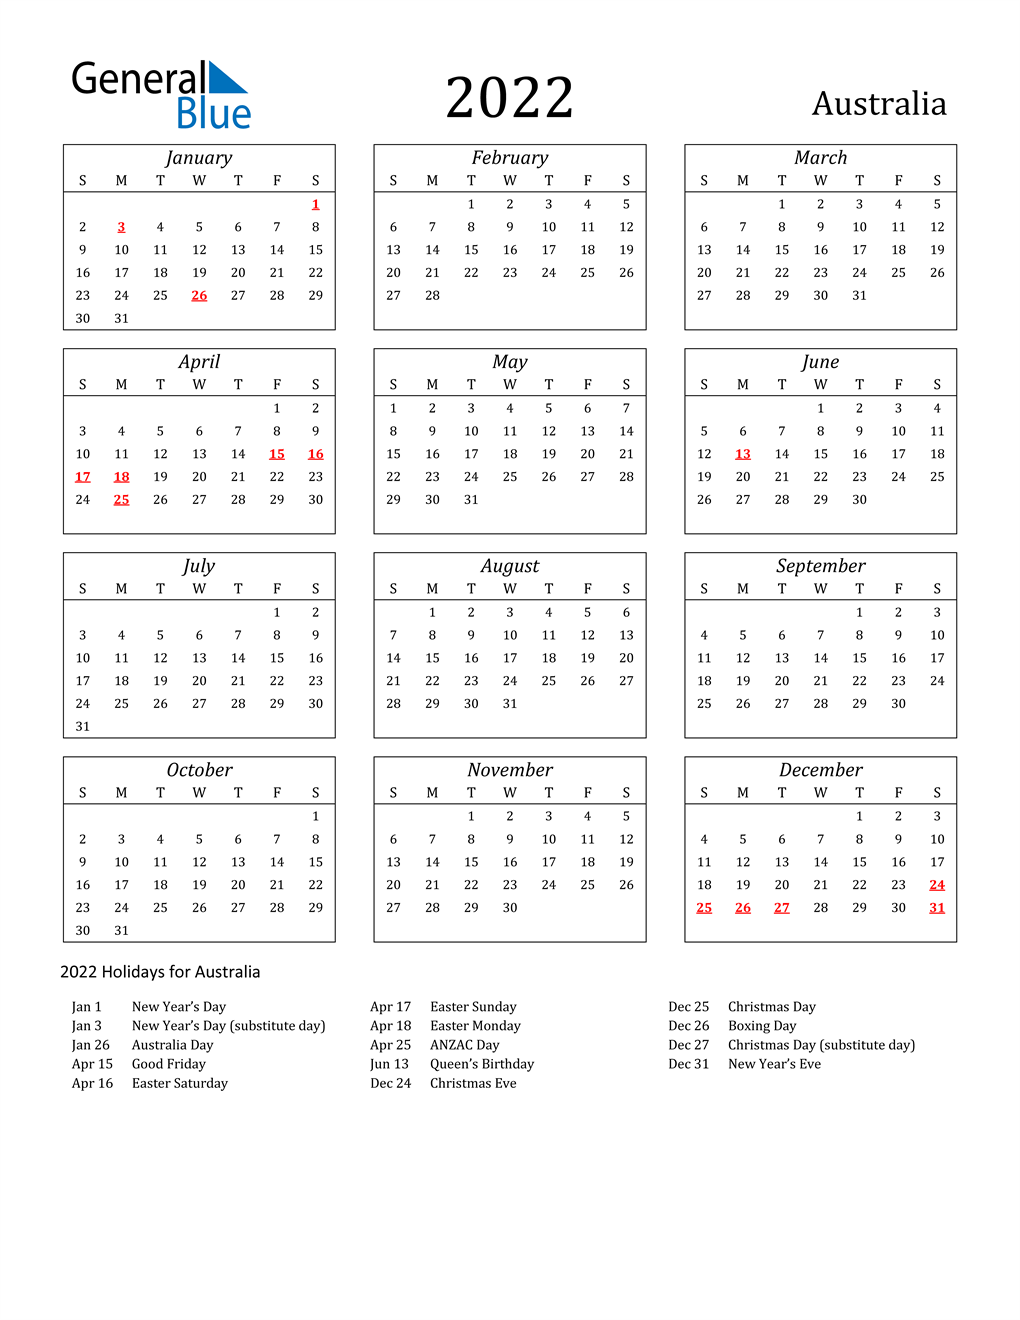 2022 Downloadable Calendar.2022 Australia Calendar With Holidays